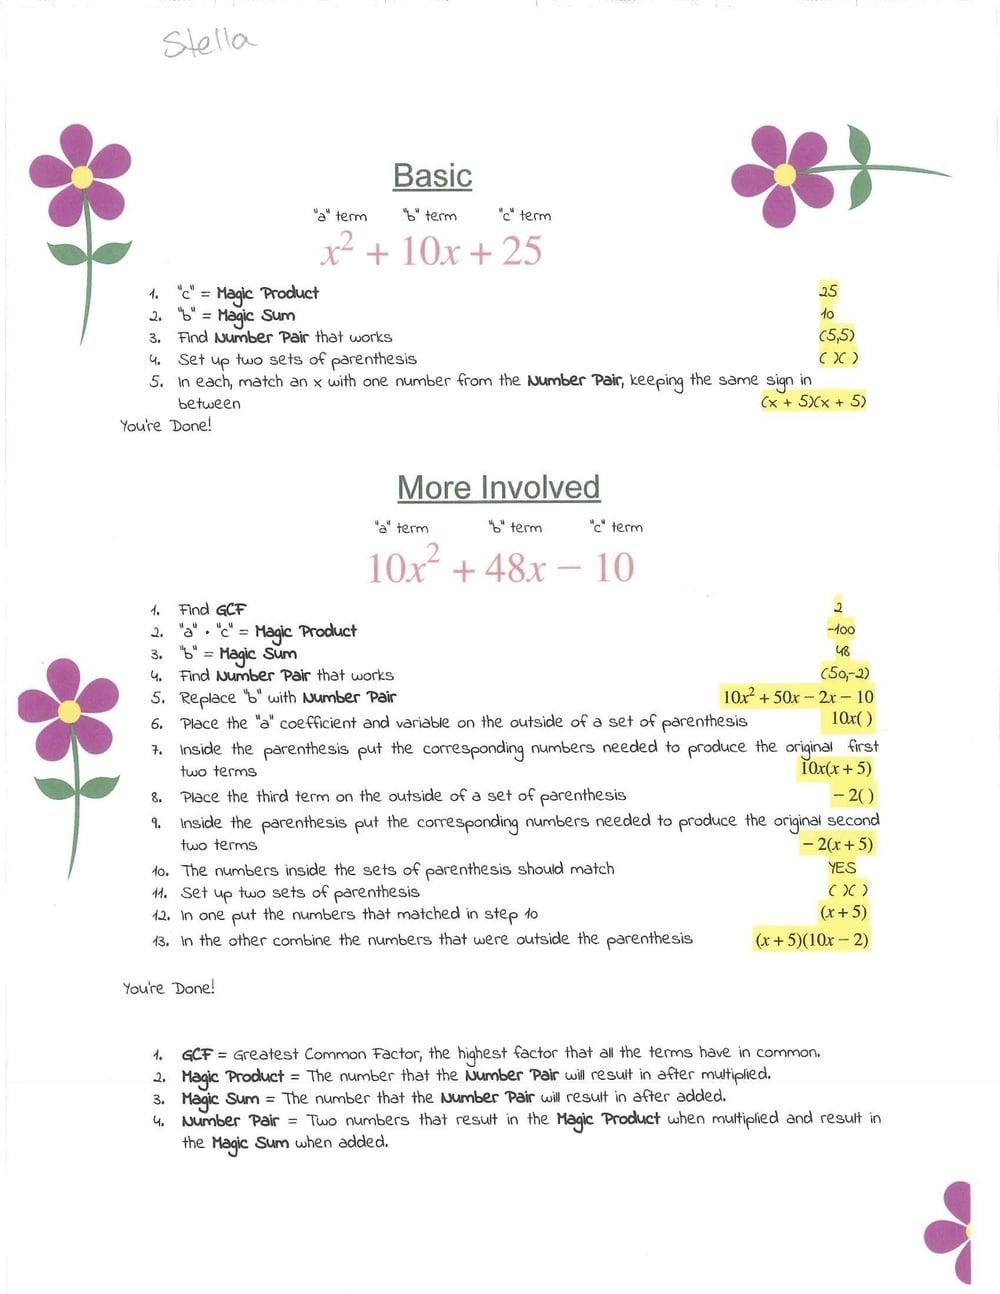 Stella Study Guide.jpg